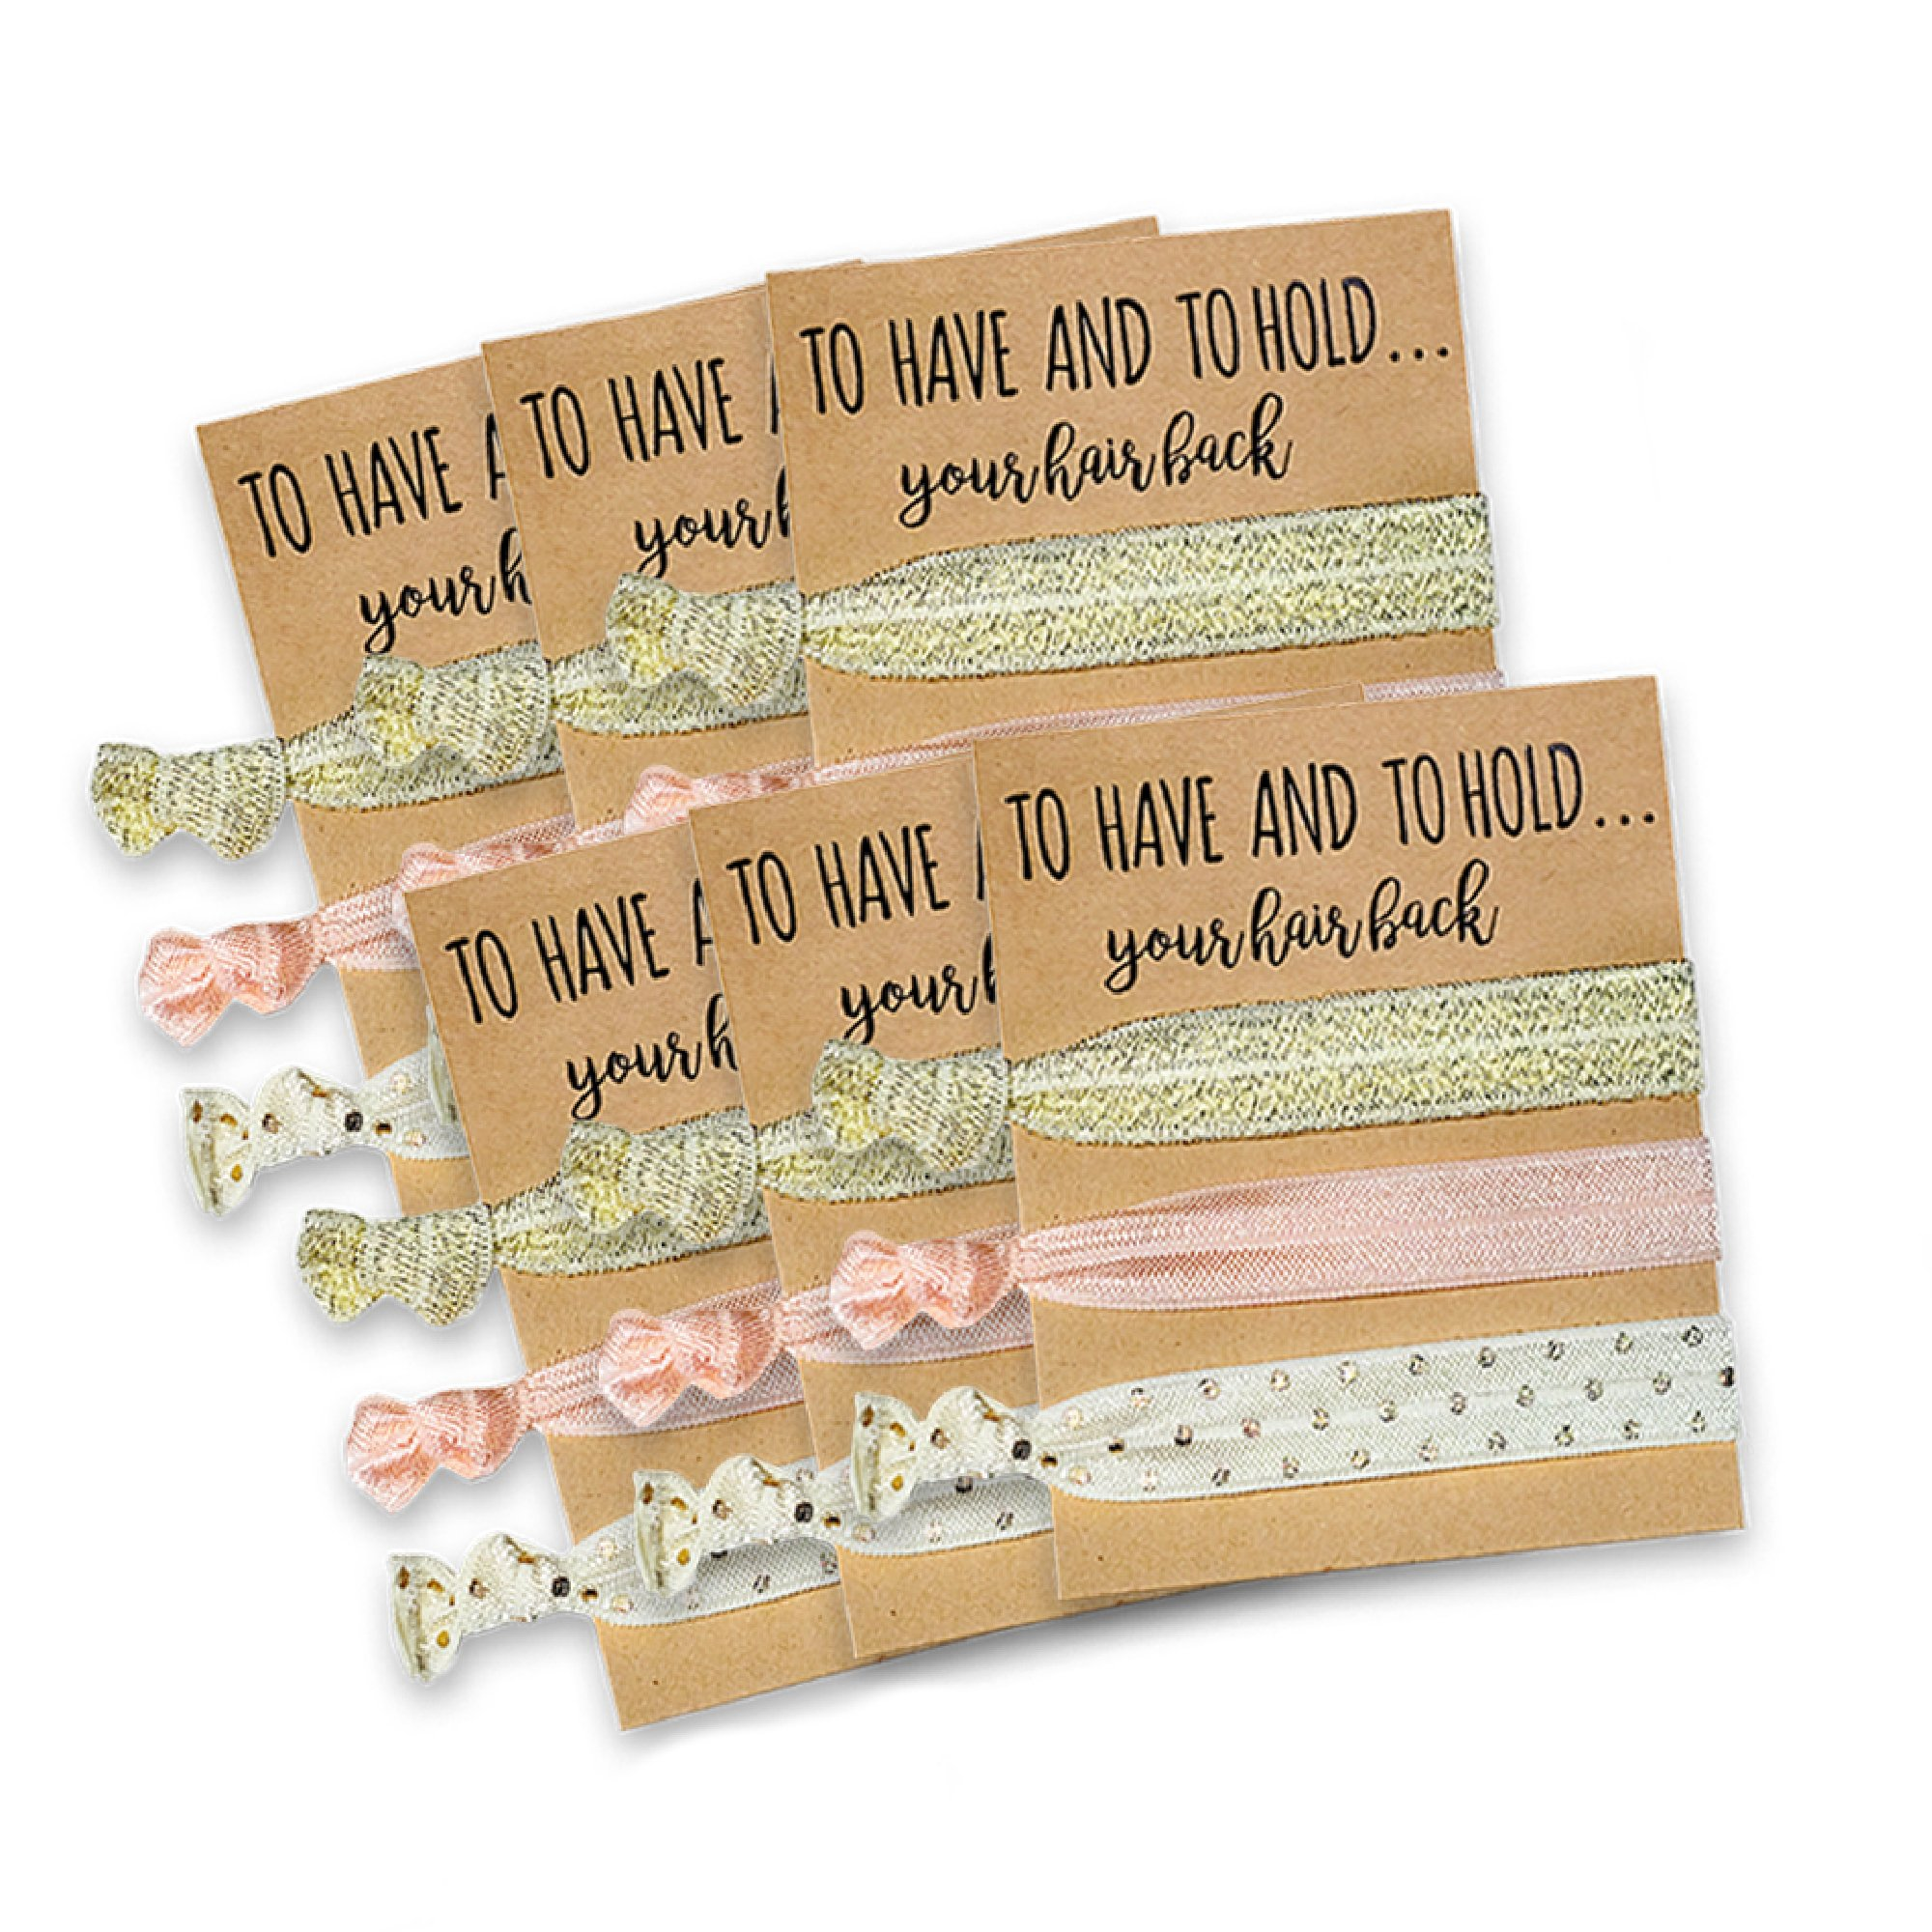 Bridesmaid Gifts Set of 6 Hair Tie Cards | Bachelorette Party Favors | Wedding Party Favors | Bridal Shower Favors by Pop Fizz Designs